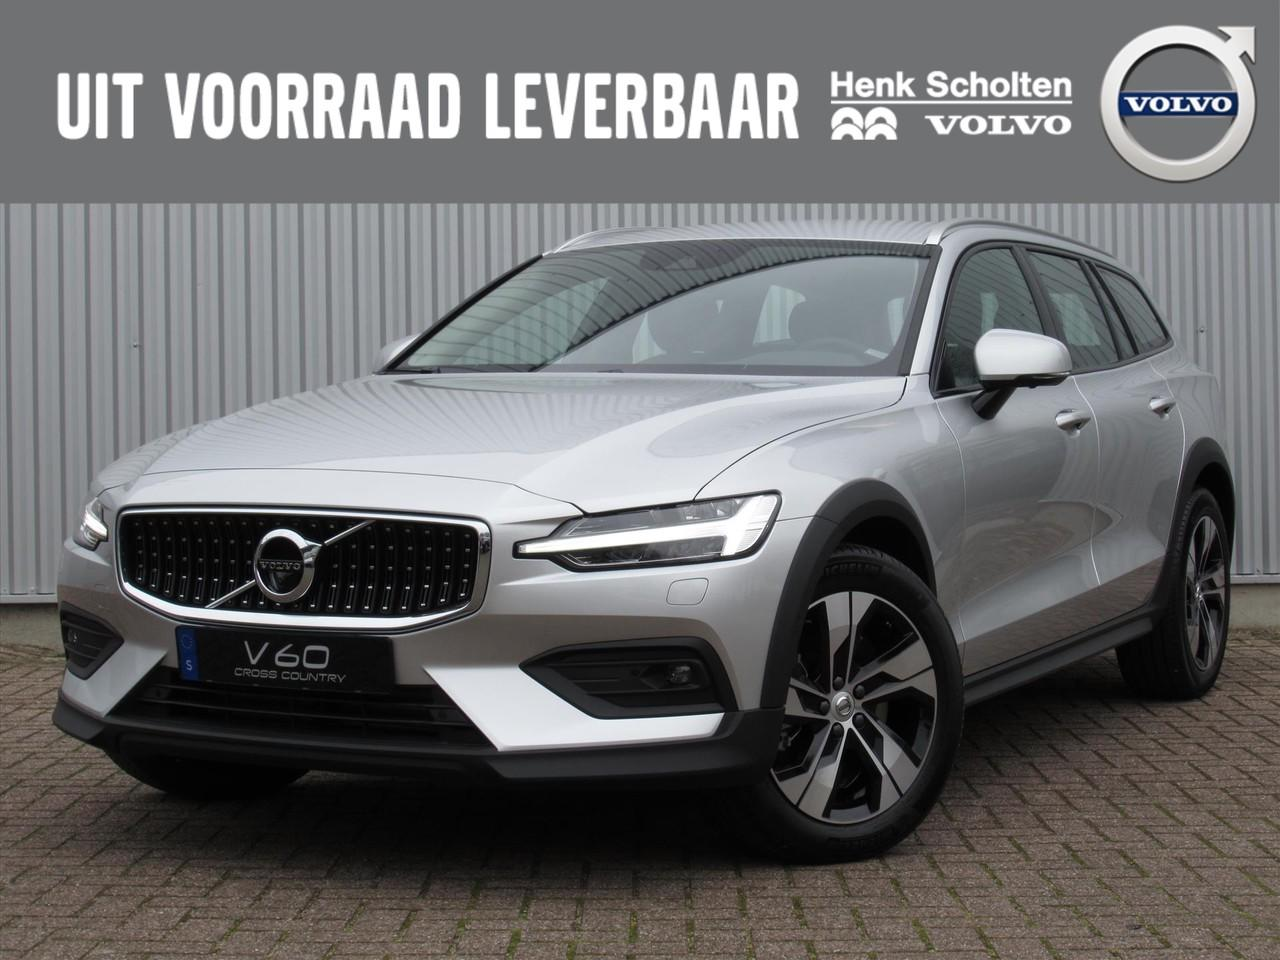 Volvo V60 cross country New d4 190pk intro edition parkeerverwarming leder